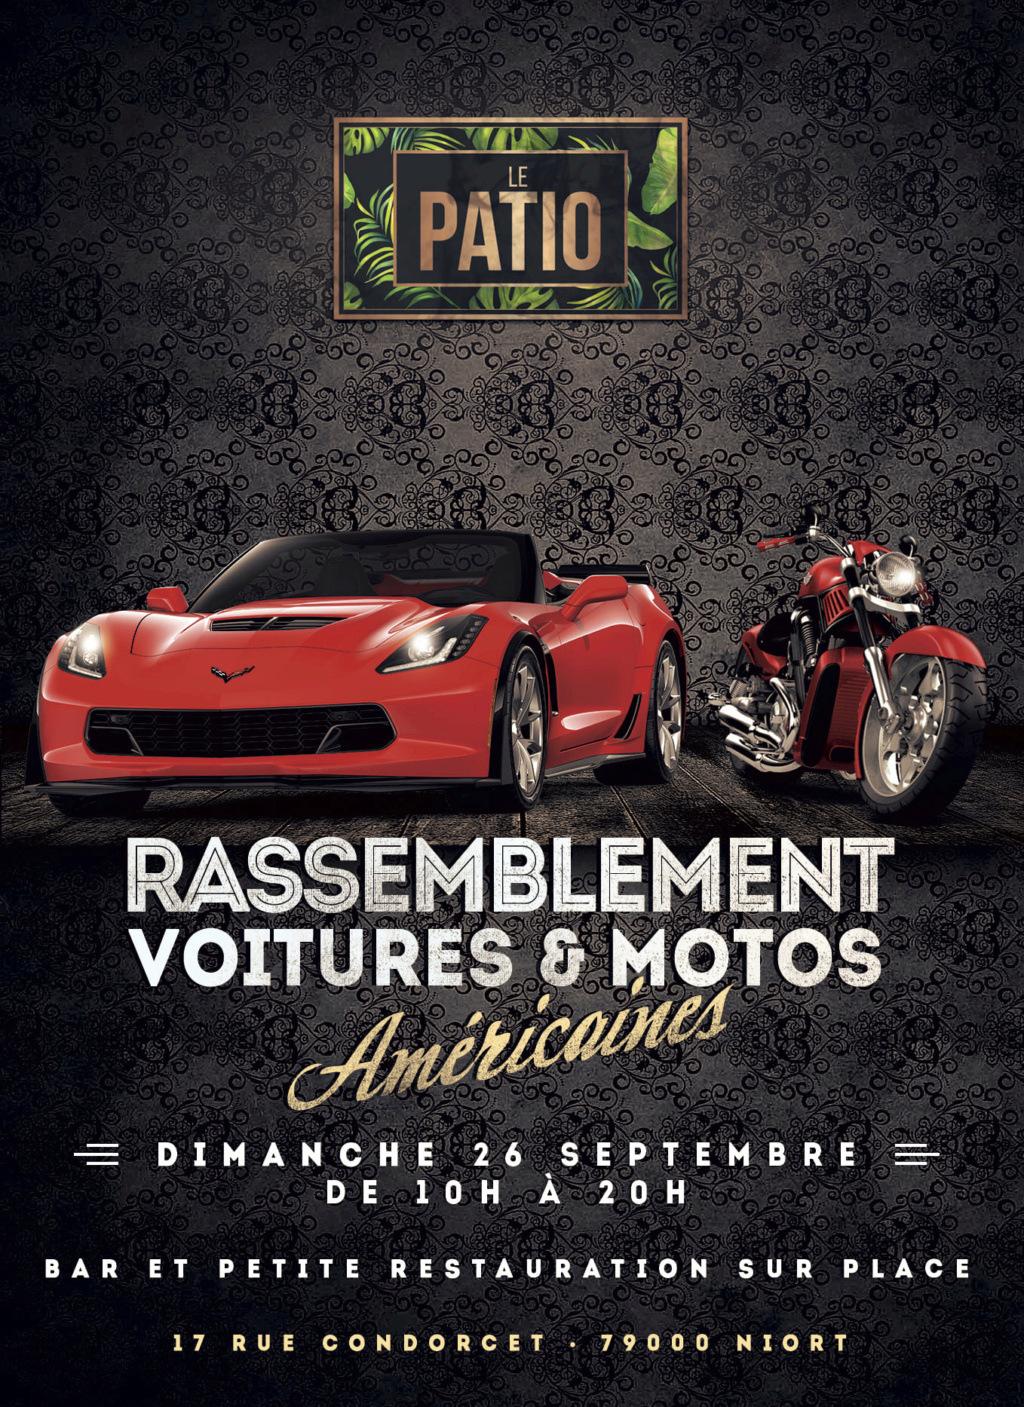 MANIFESTATION - Rassemblement - Voitures & Motos - Dimanche 26 Septembre 2021 - Niort (79000)  24111210